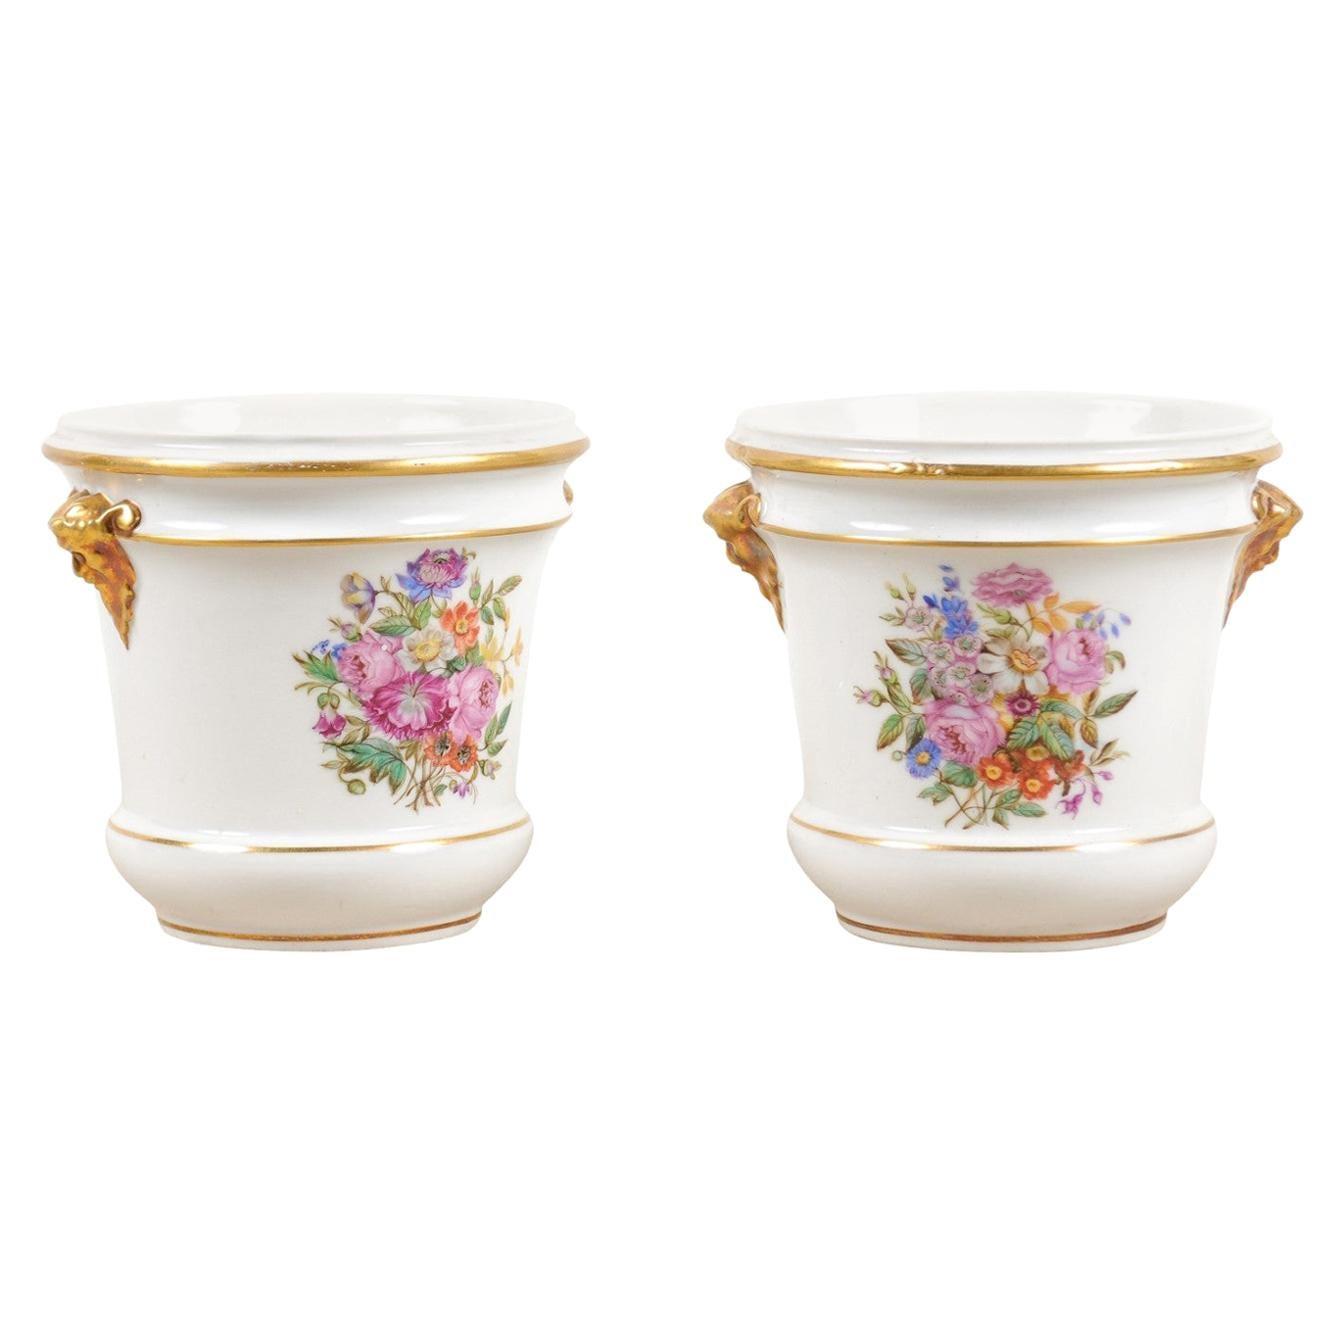 Pair of French Late 18th Century Paris Porcelain Cachepots with Floral Décor